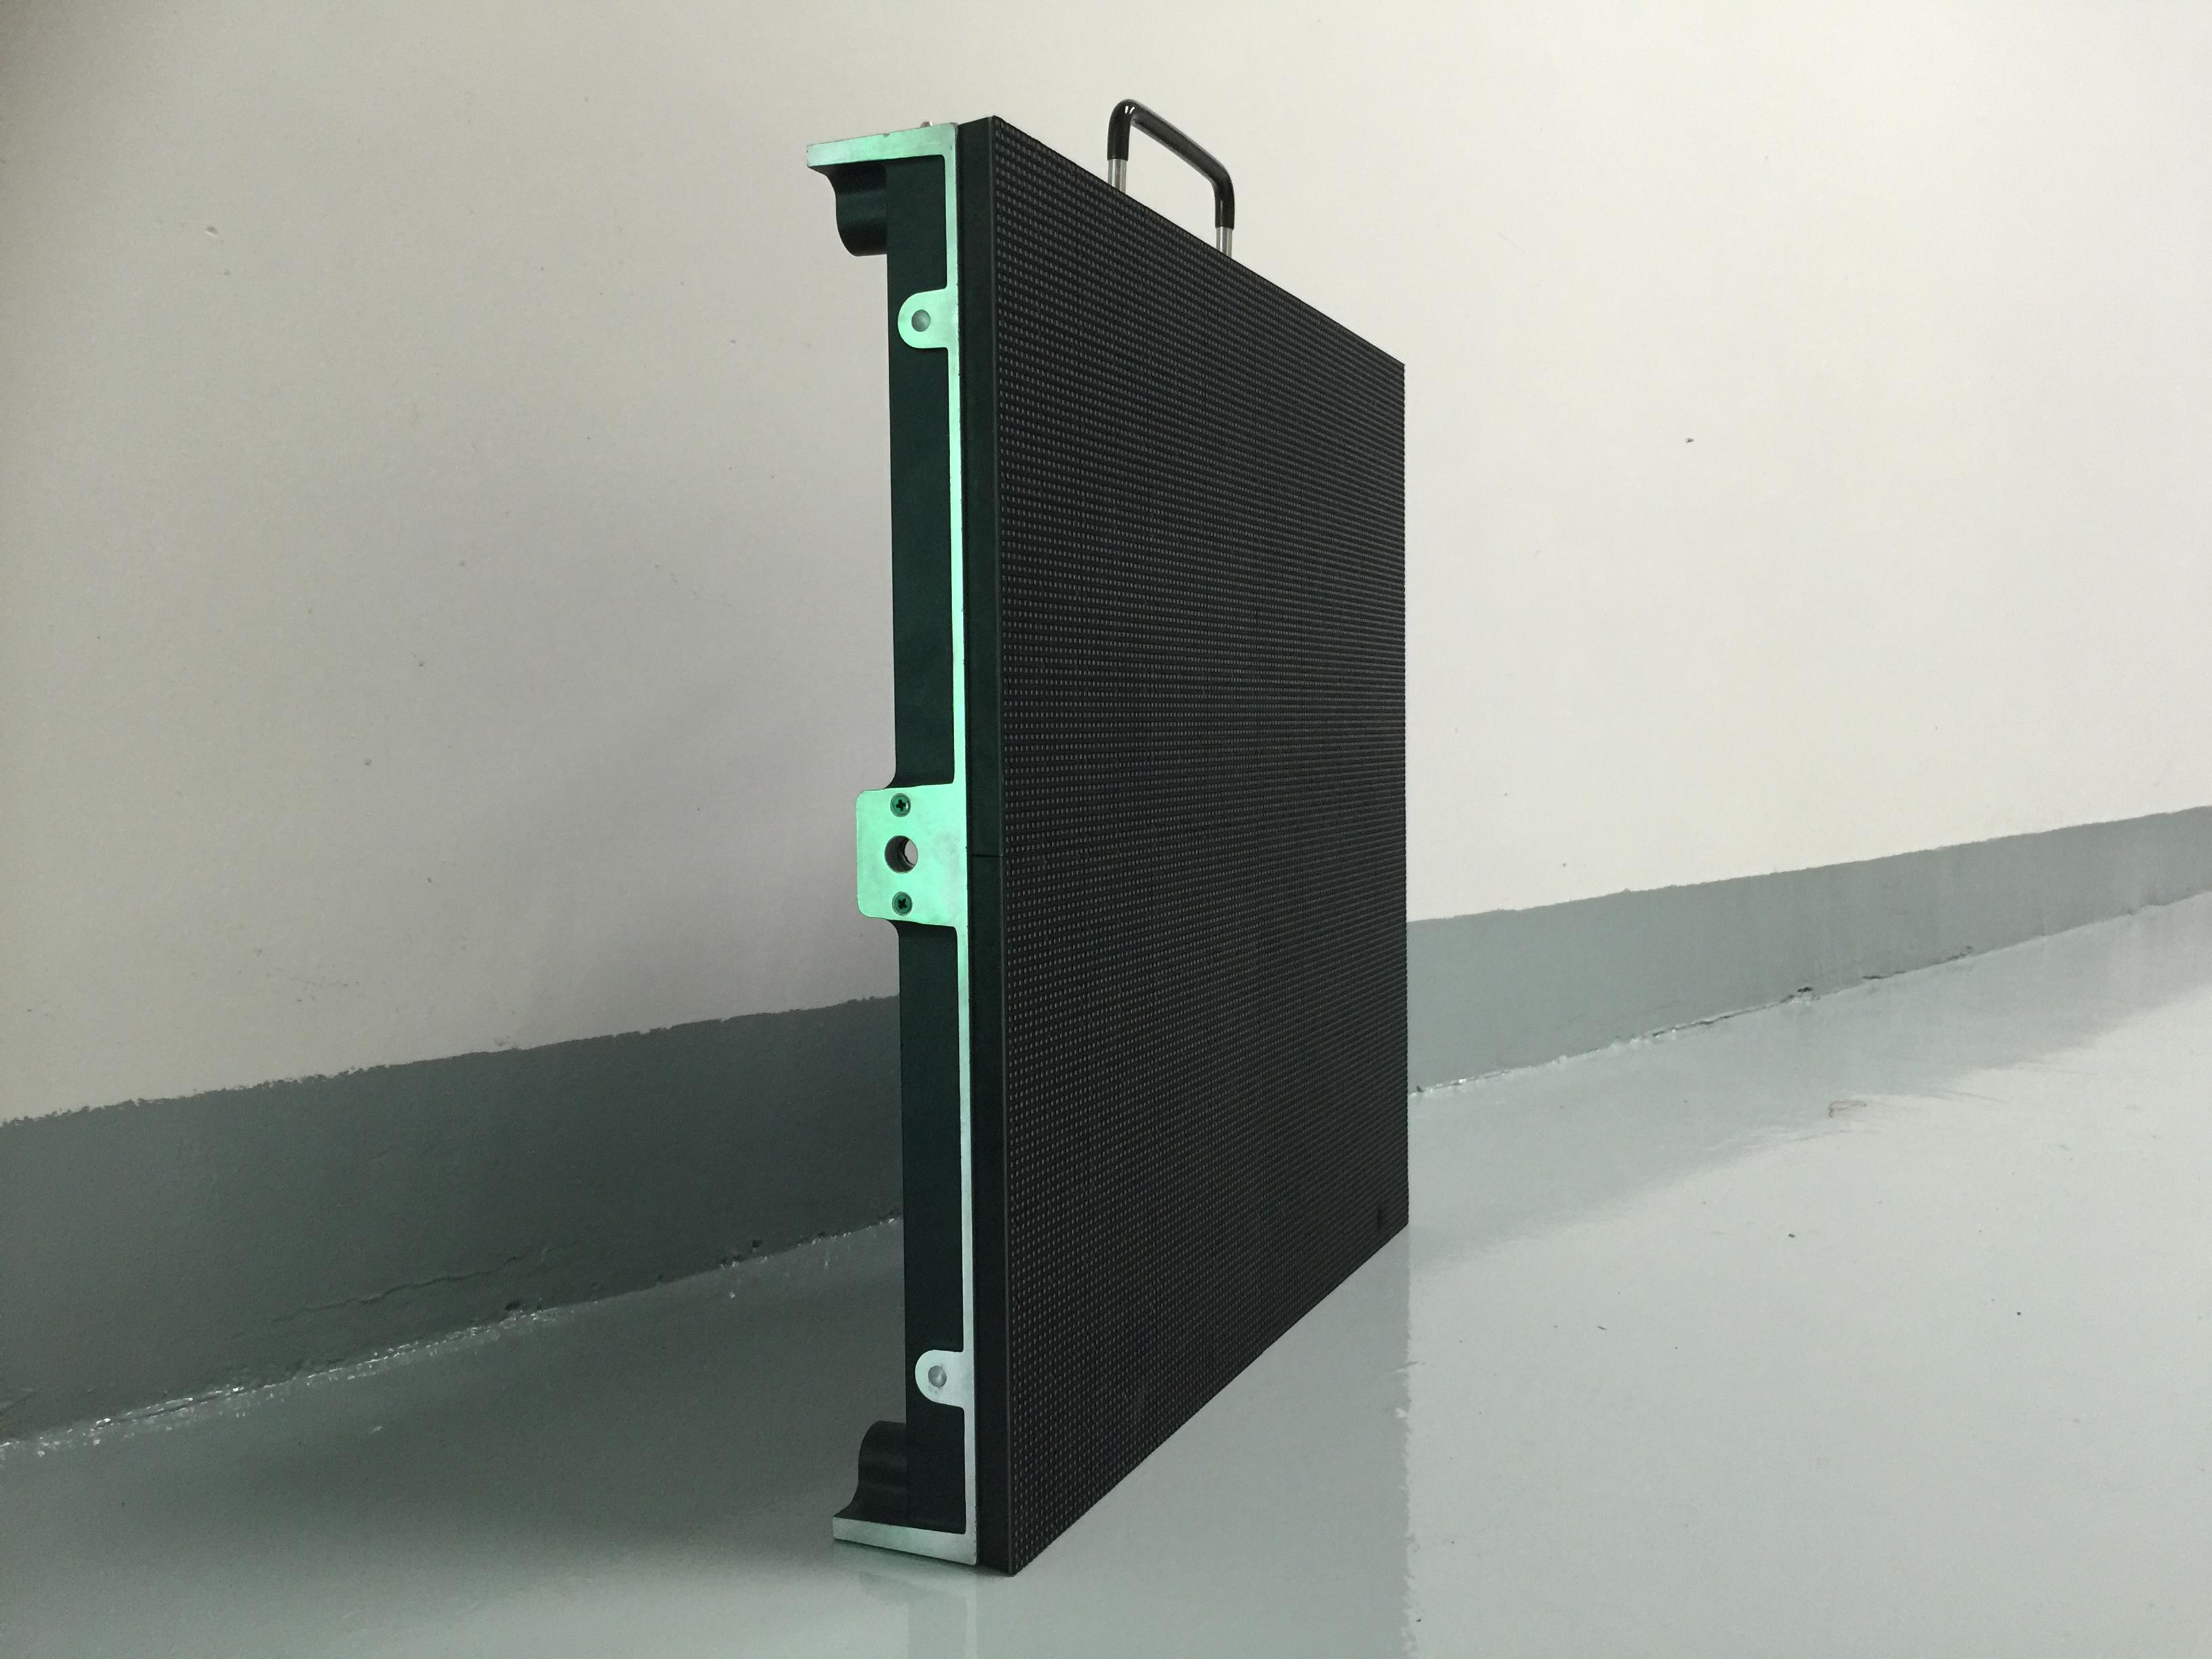 P3.91室内租赁全彩